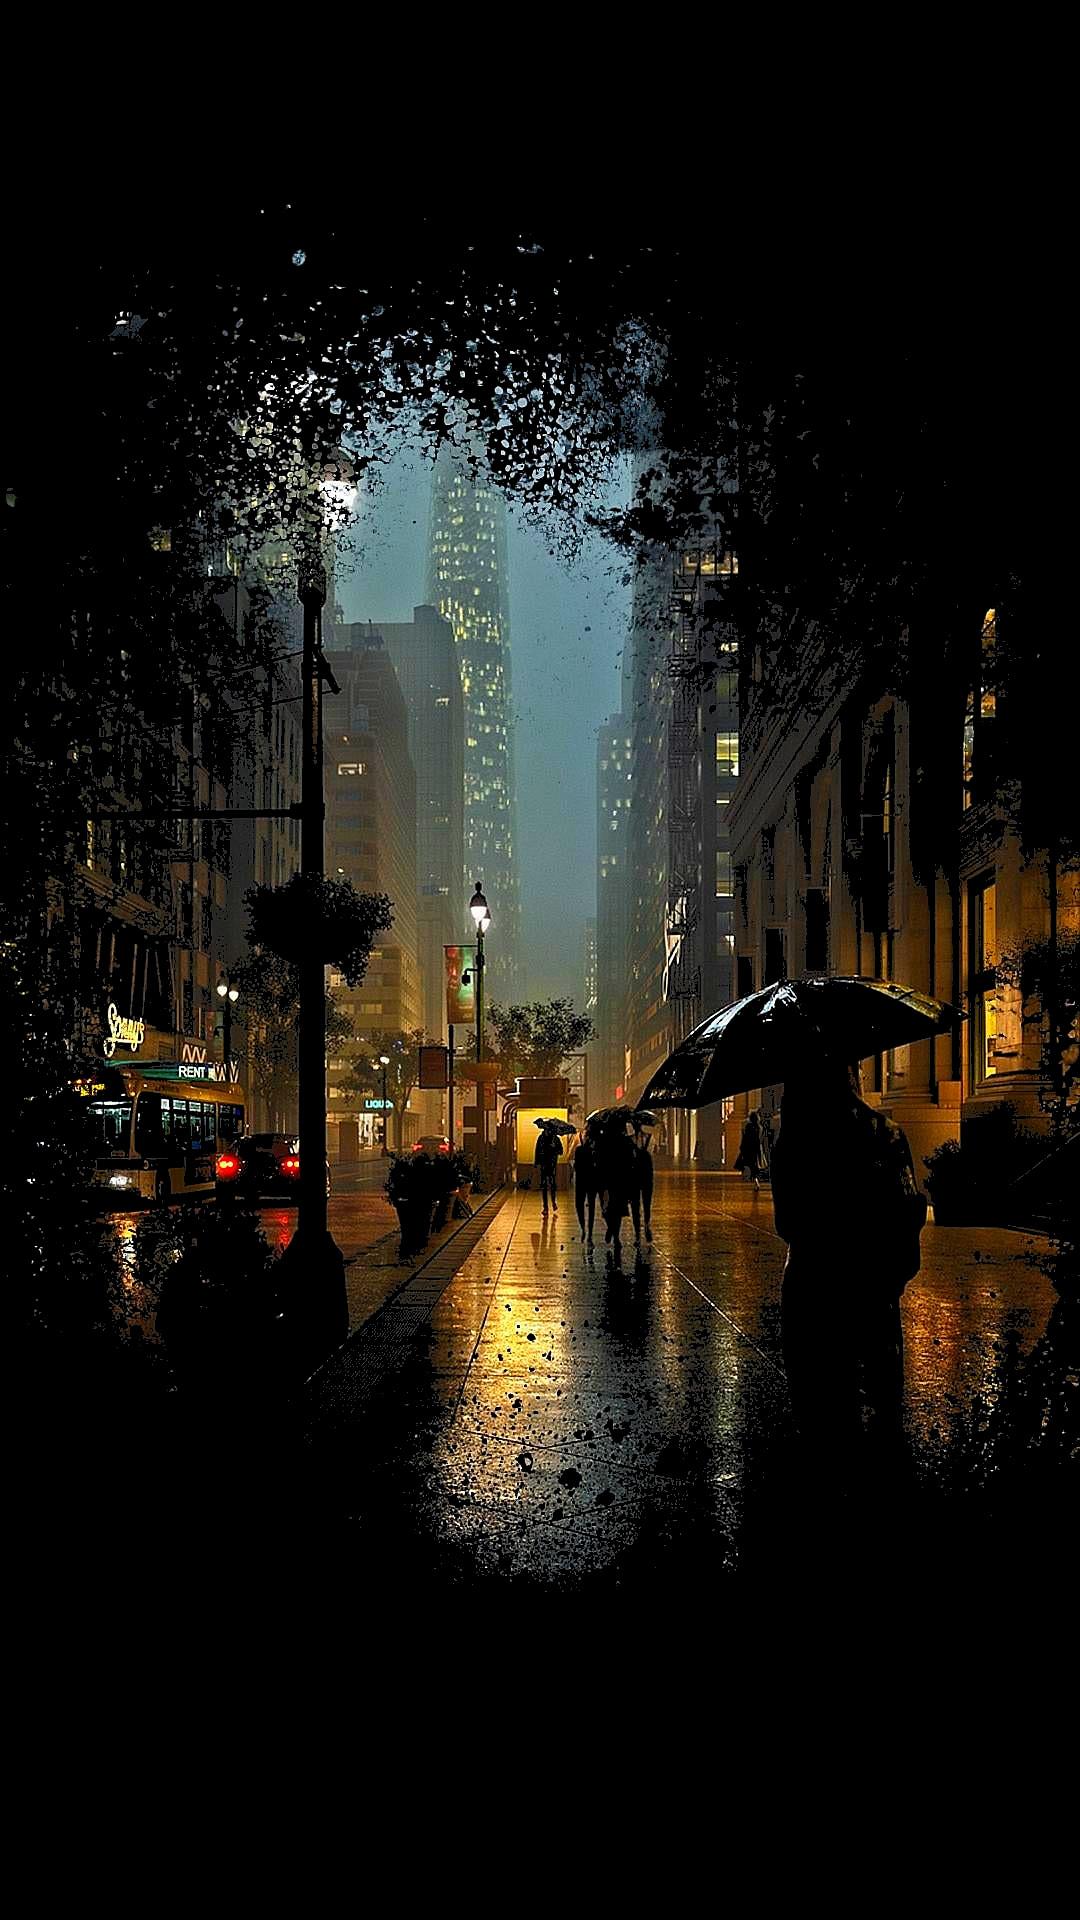 Rainy Night View Iphone Wallpaper